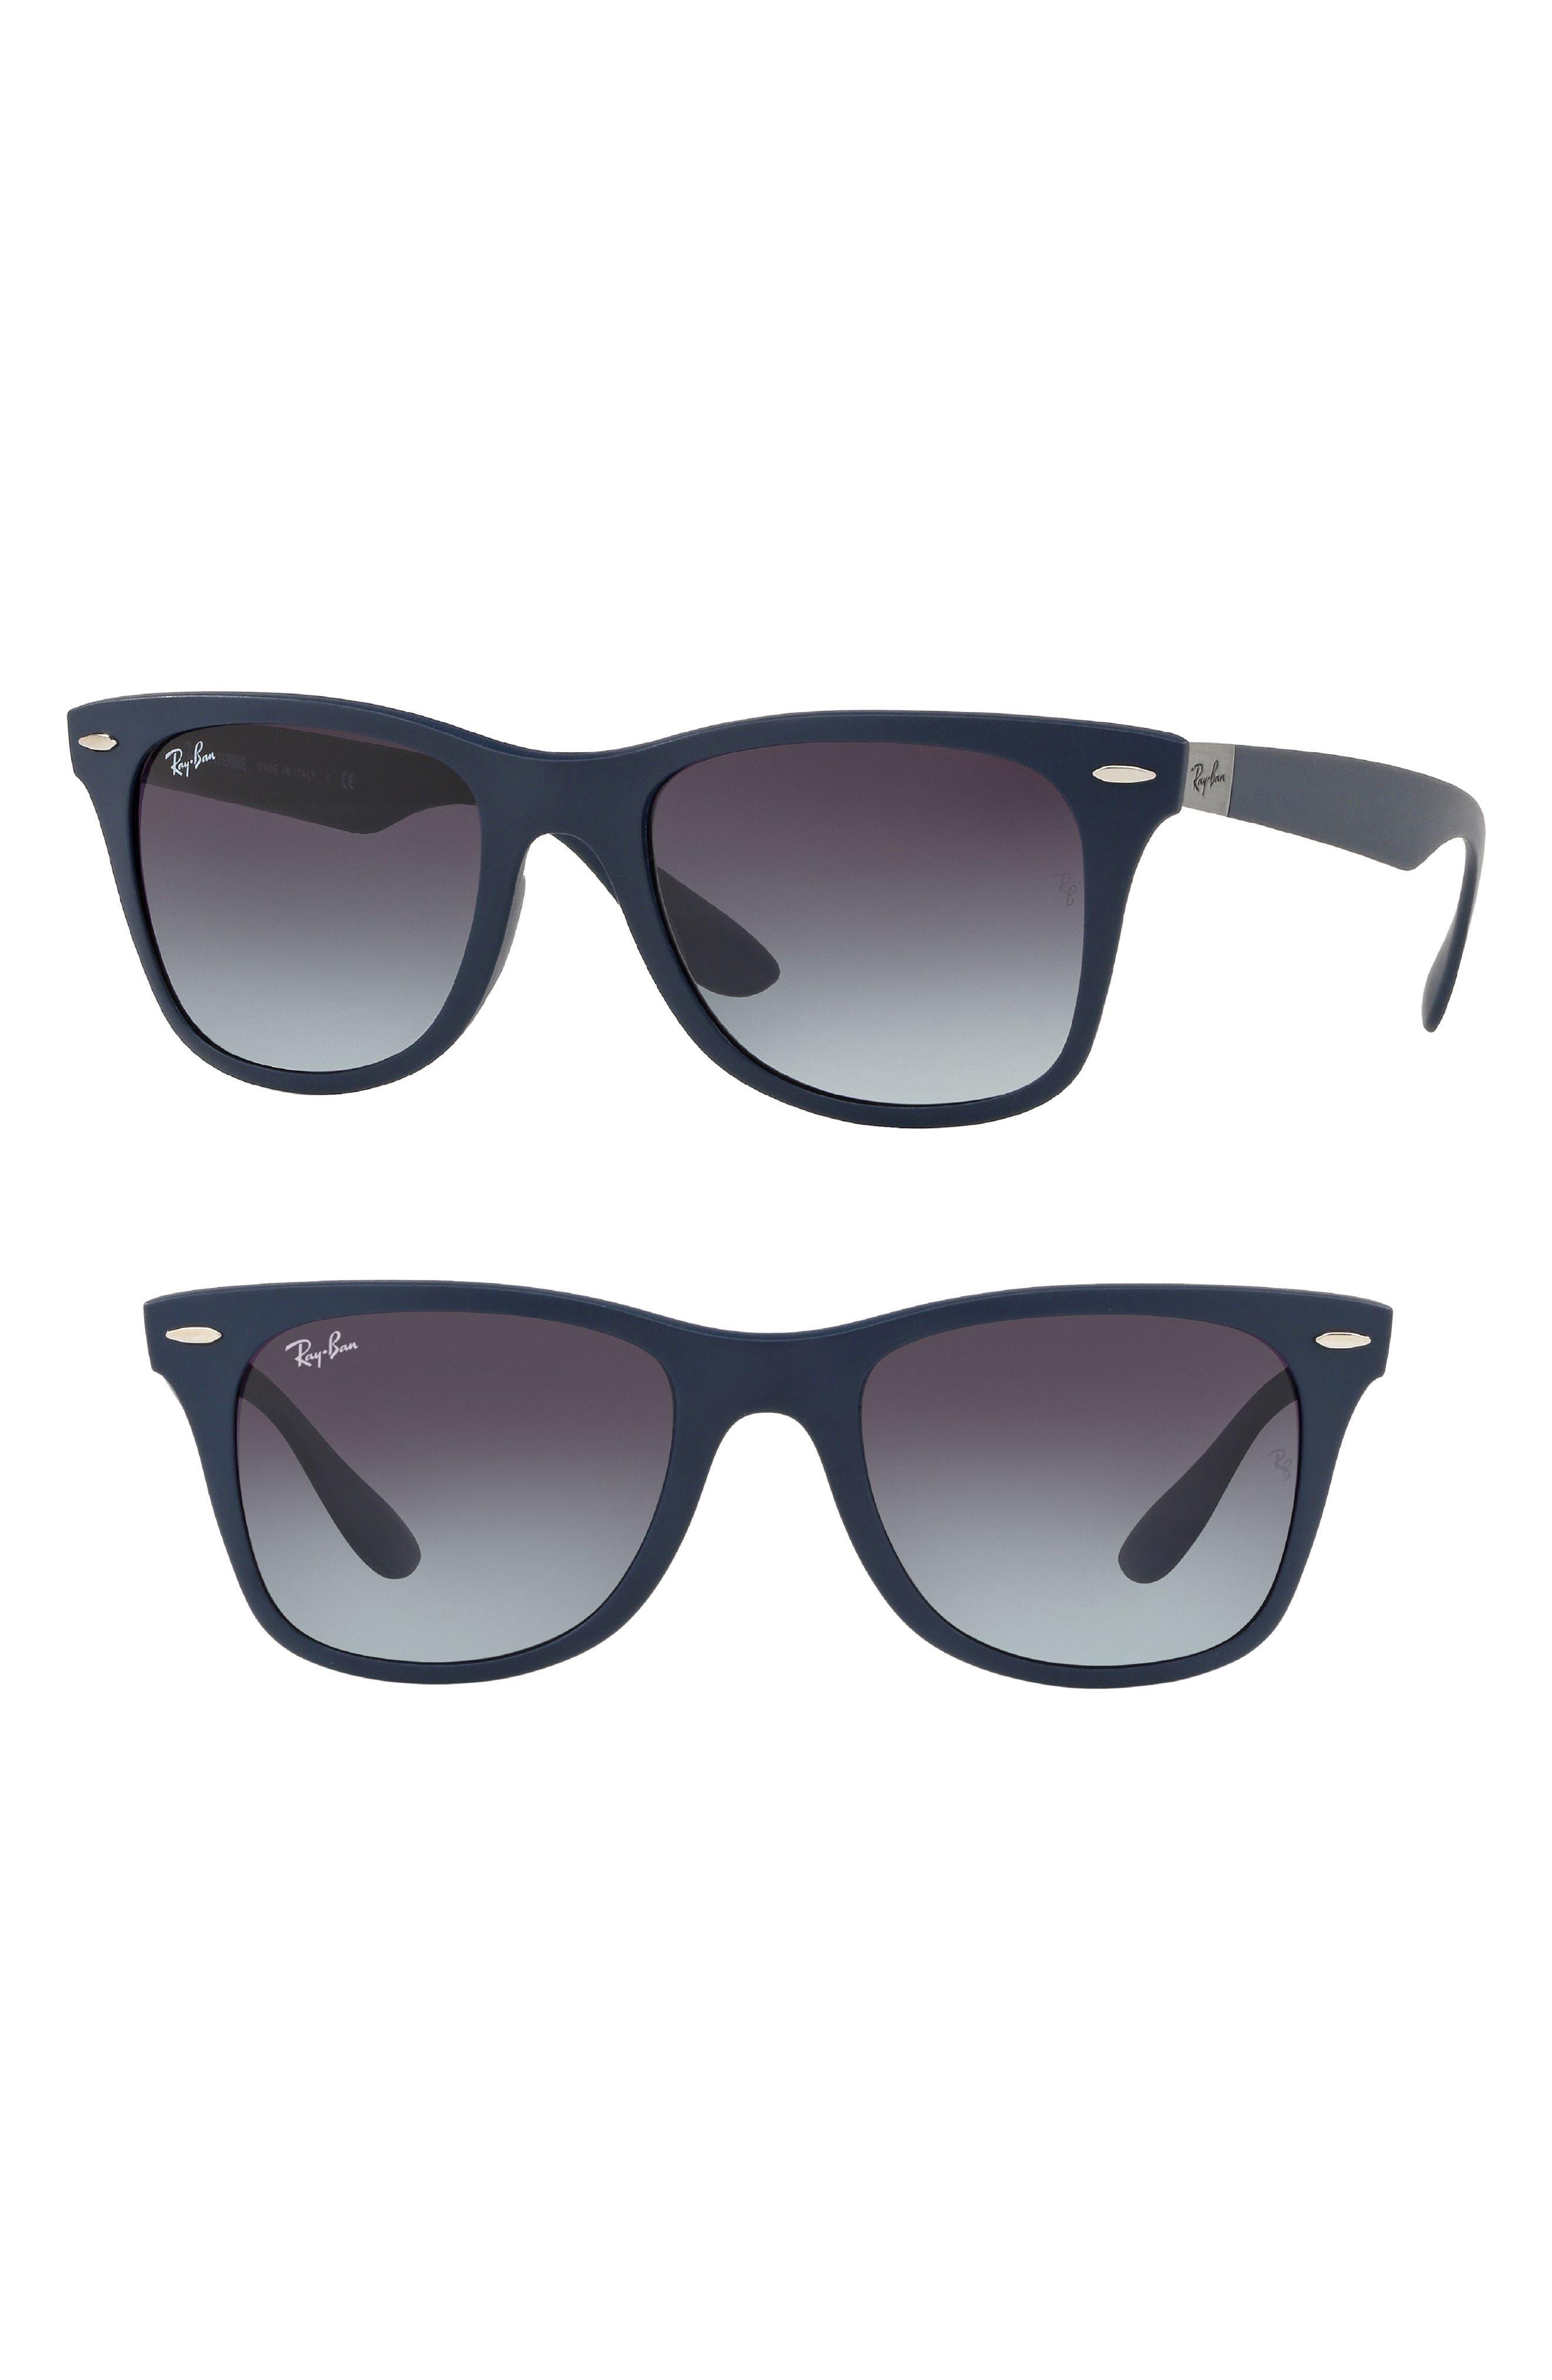 Ray-Ban Wayfarer Liteforce 52mm Sunglasses